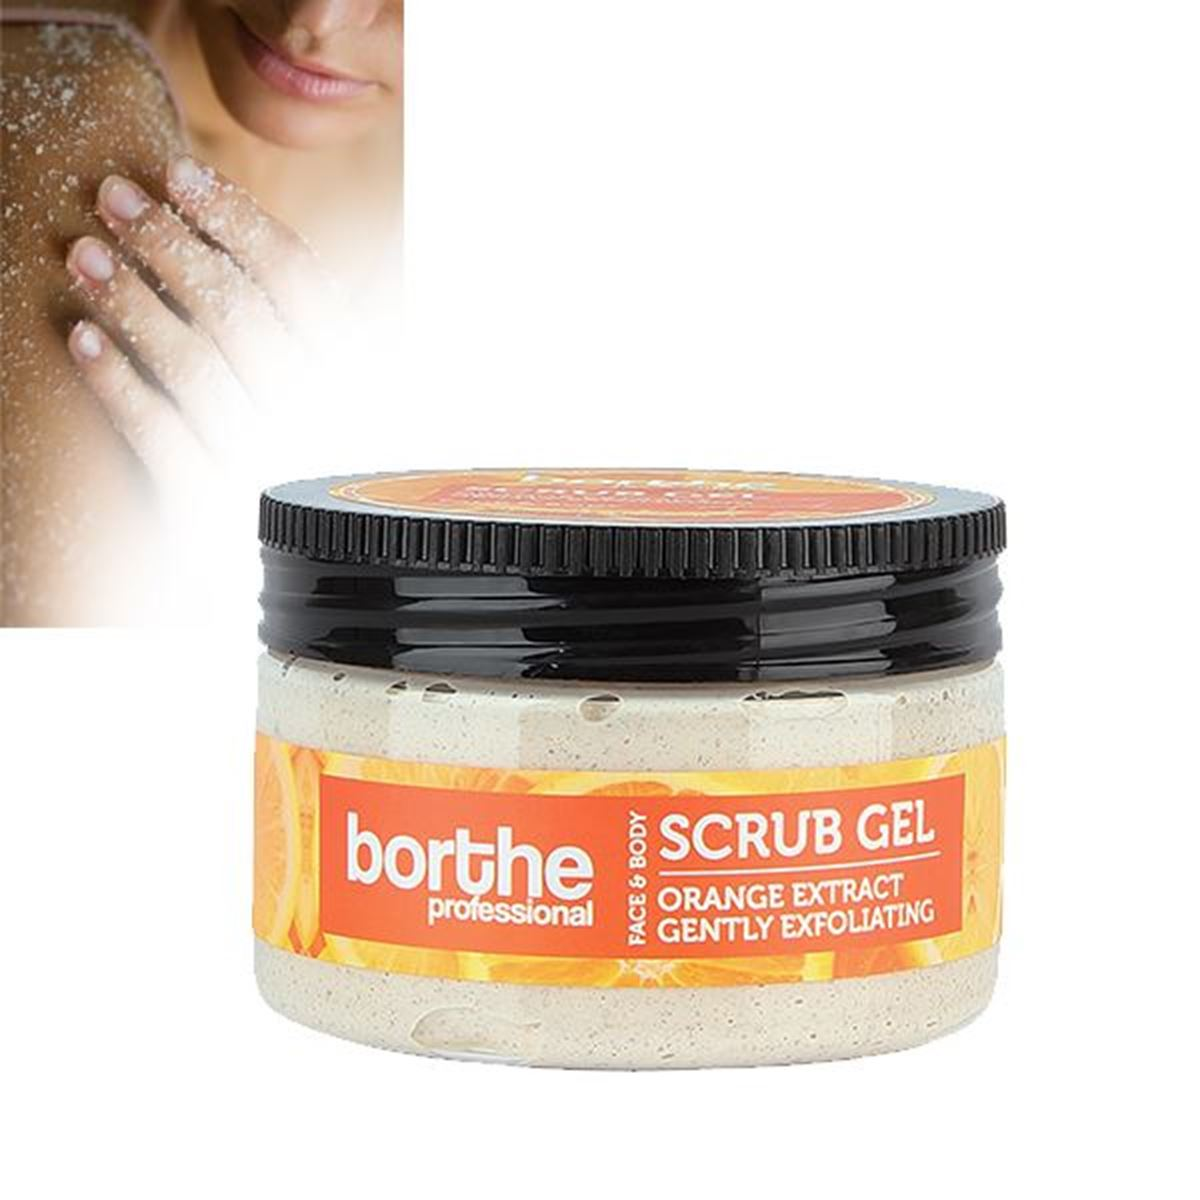 Borthe Orange Scrub Gel 300ml